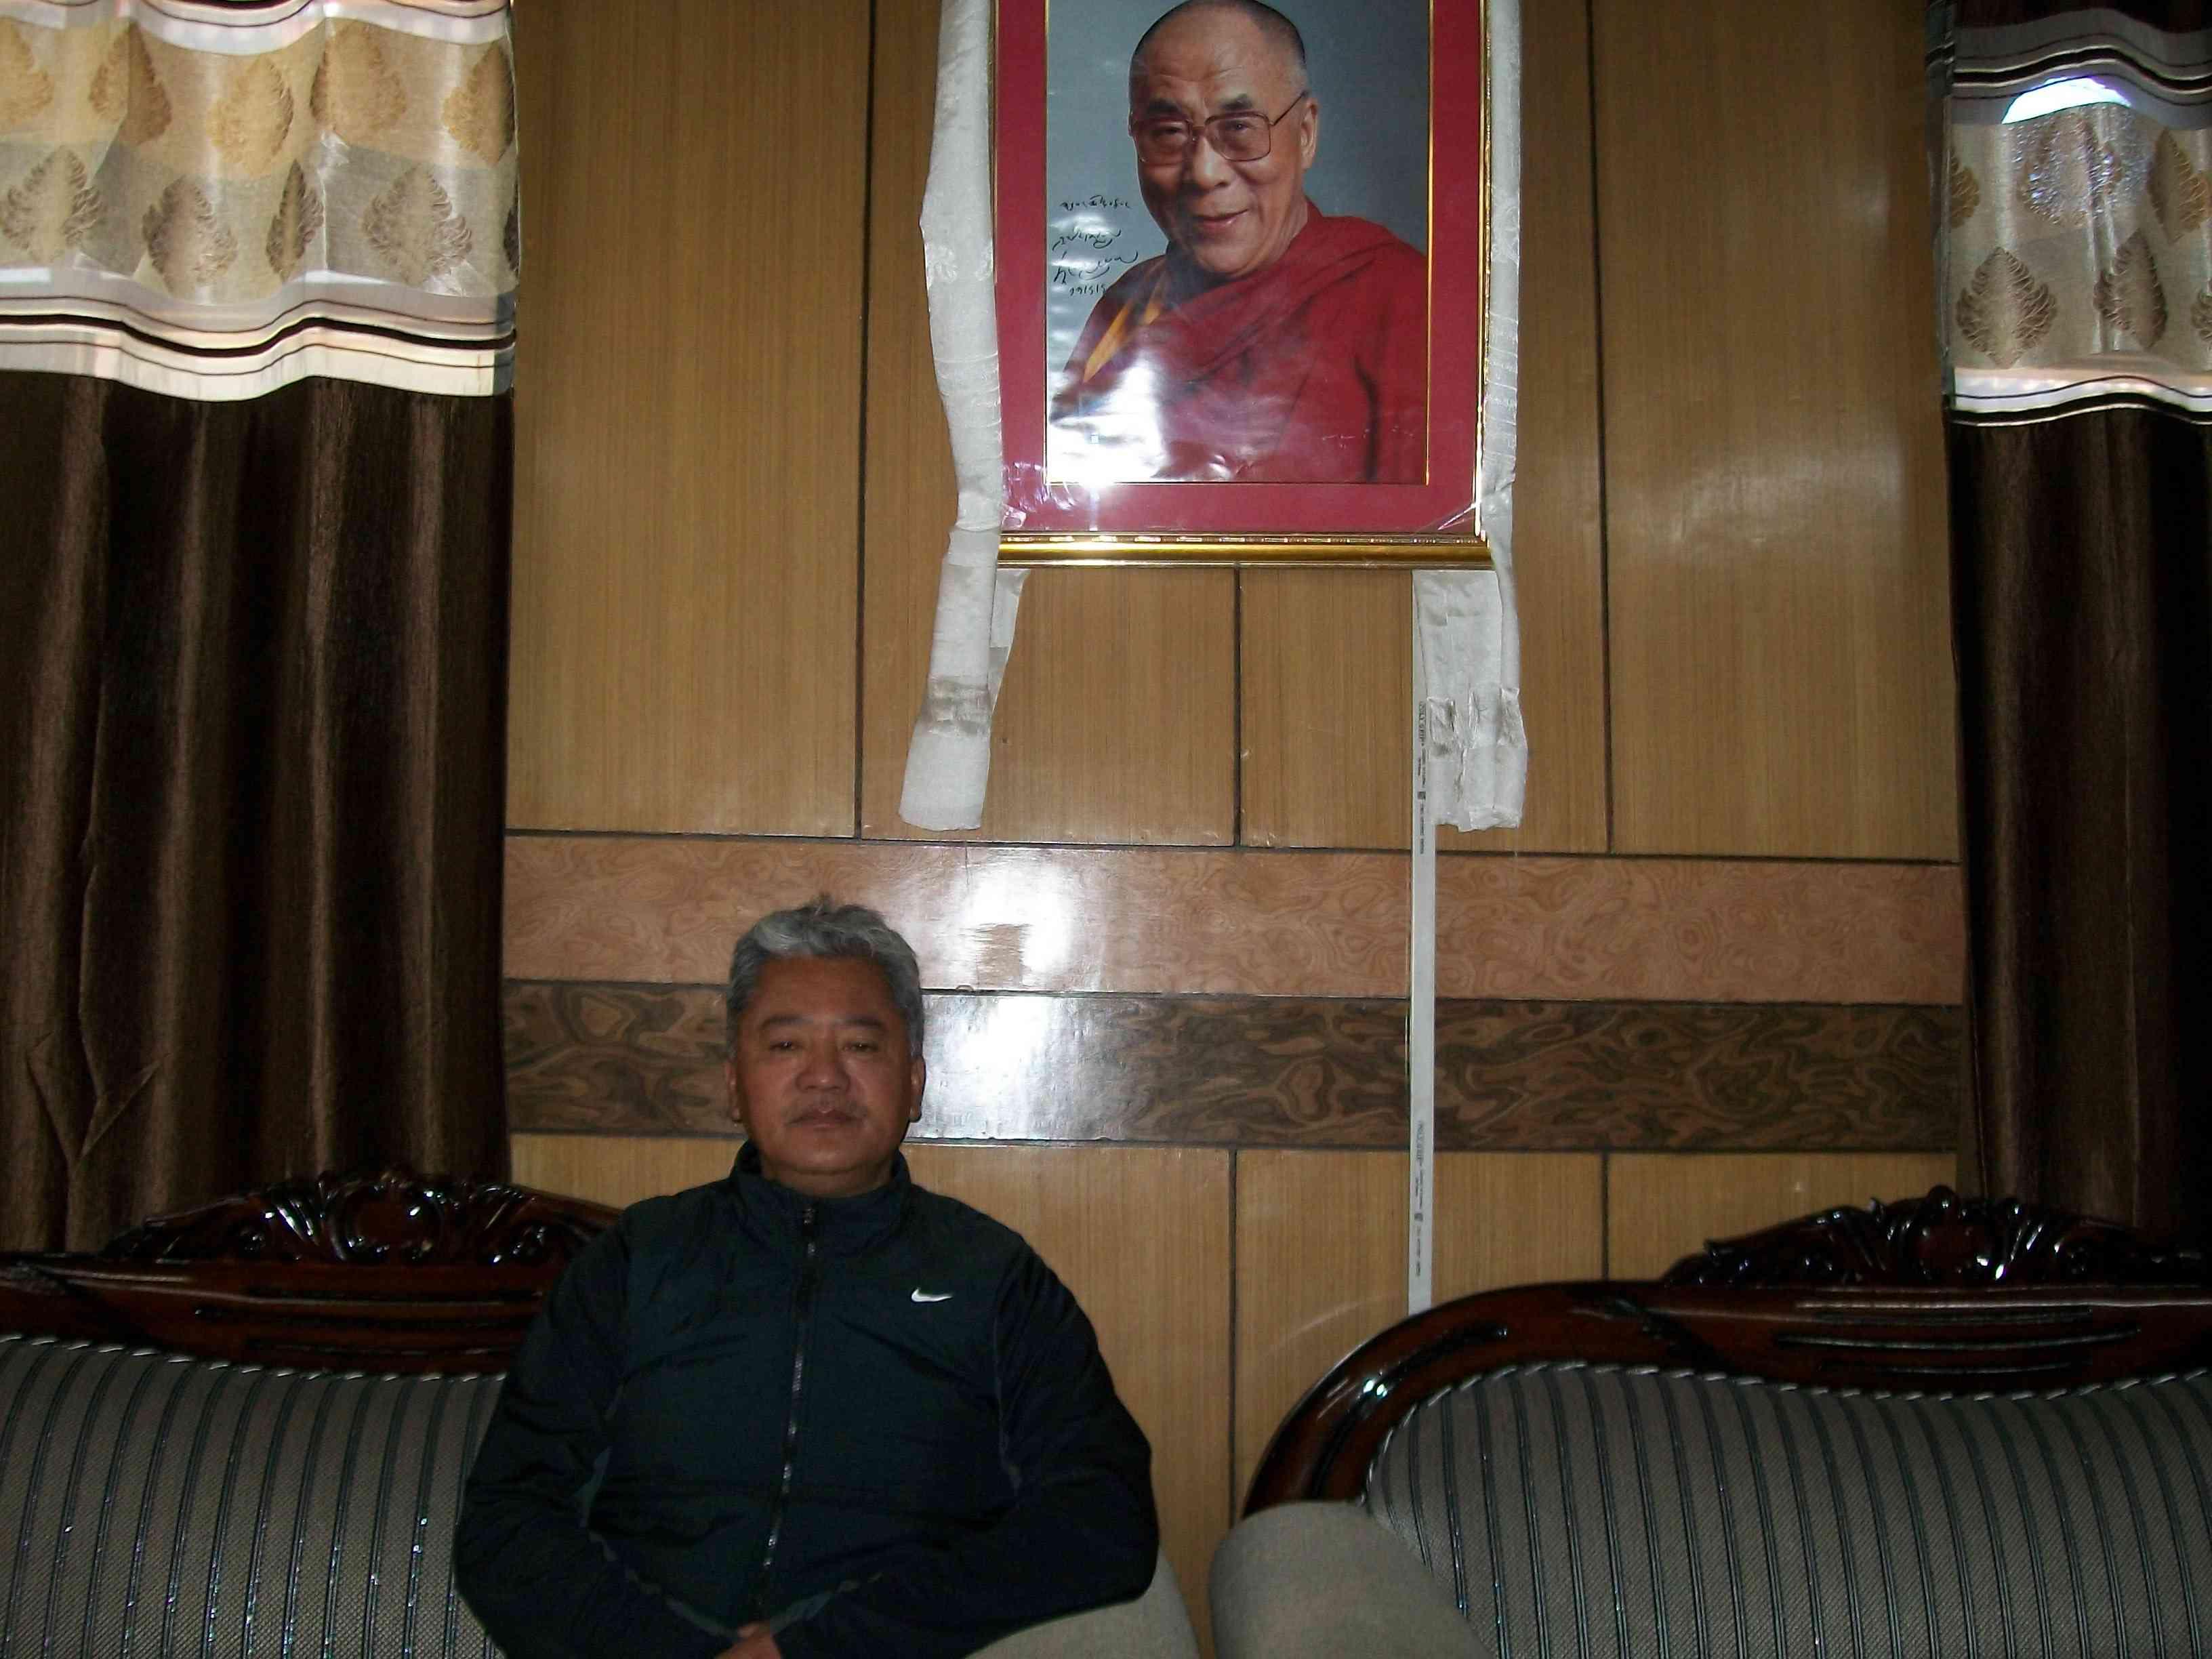 PT Kunzang, vice president of the Ladakh Buddhist Association